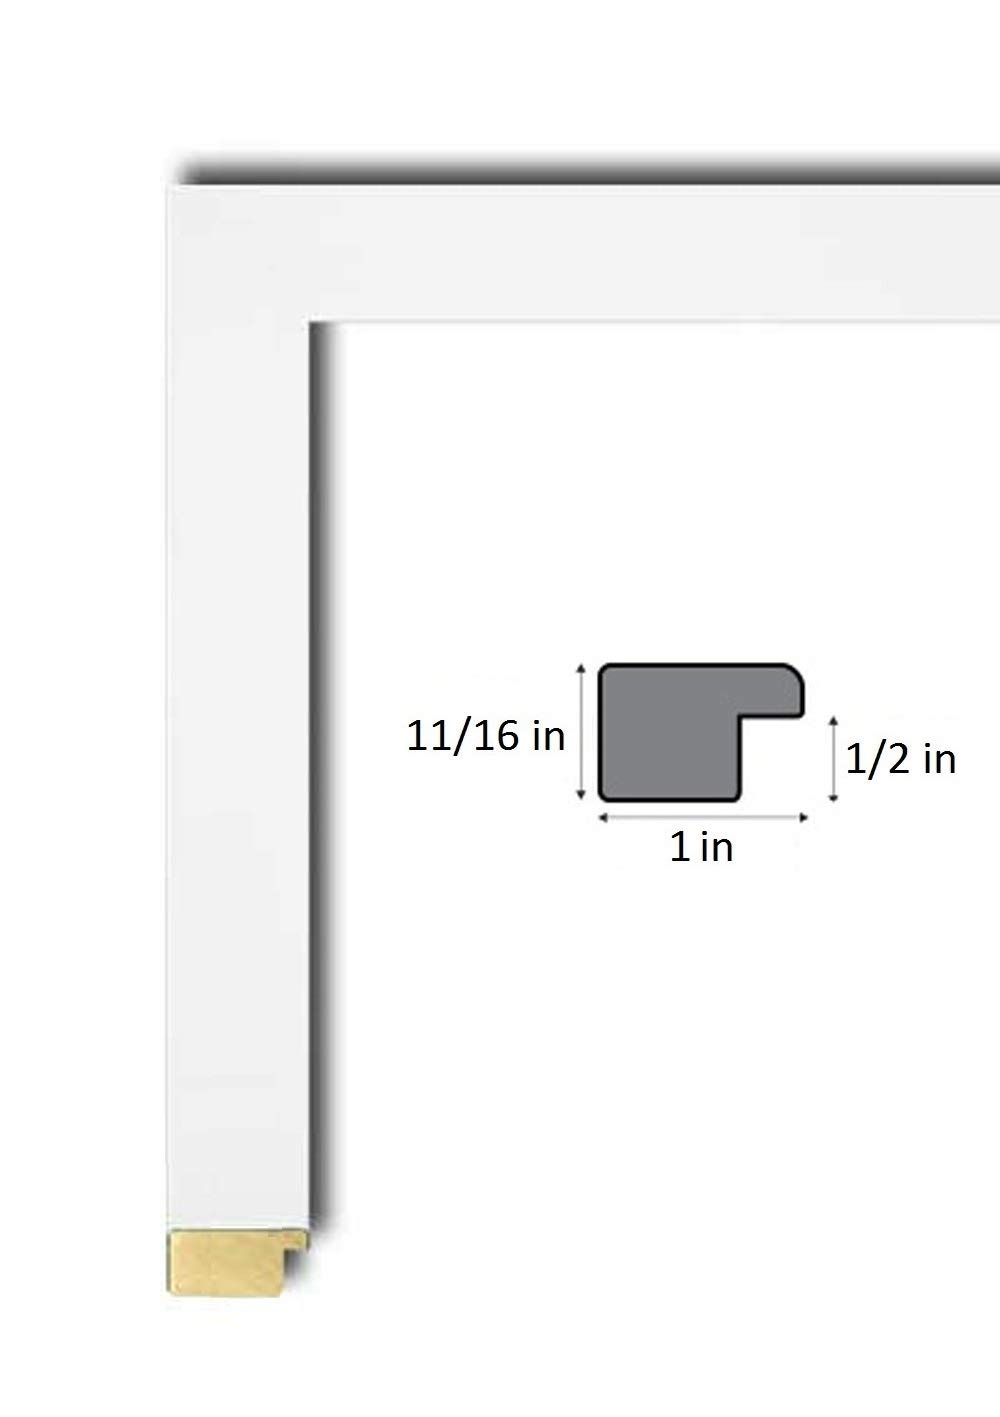 24x32 Advanced White Wood Poster Frame, UV Acrylic Clear Sheet, Foam Board Backing